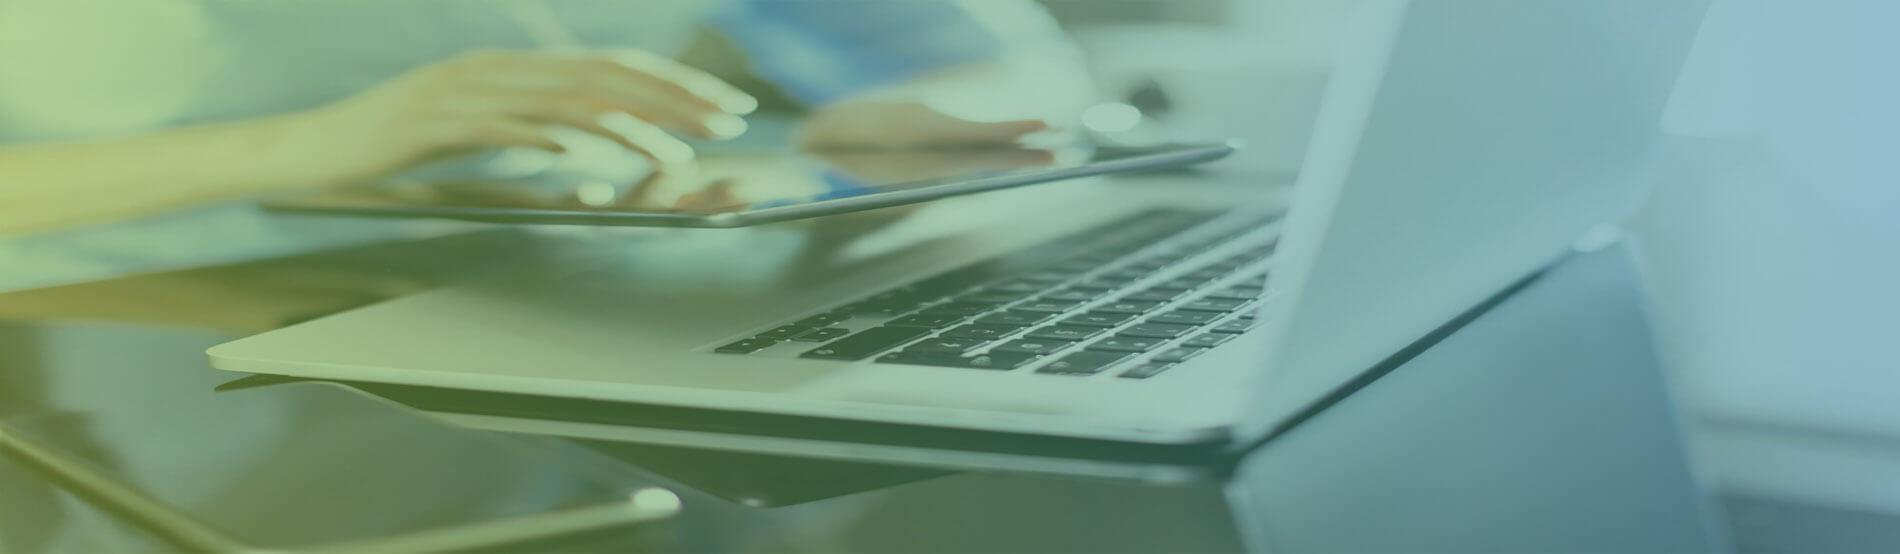 PC, laptop of tablet hulp nodig?